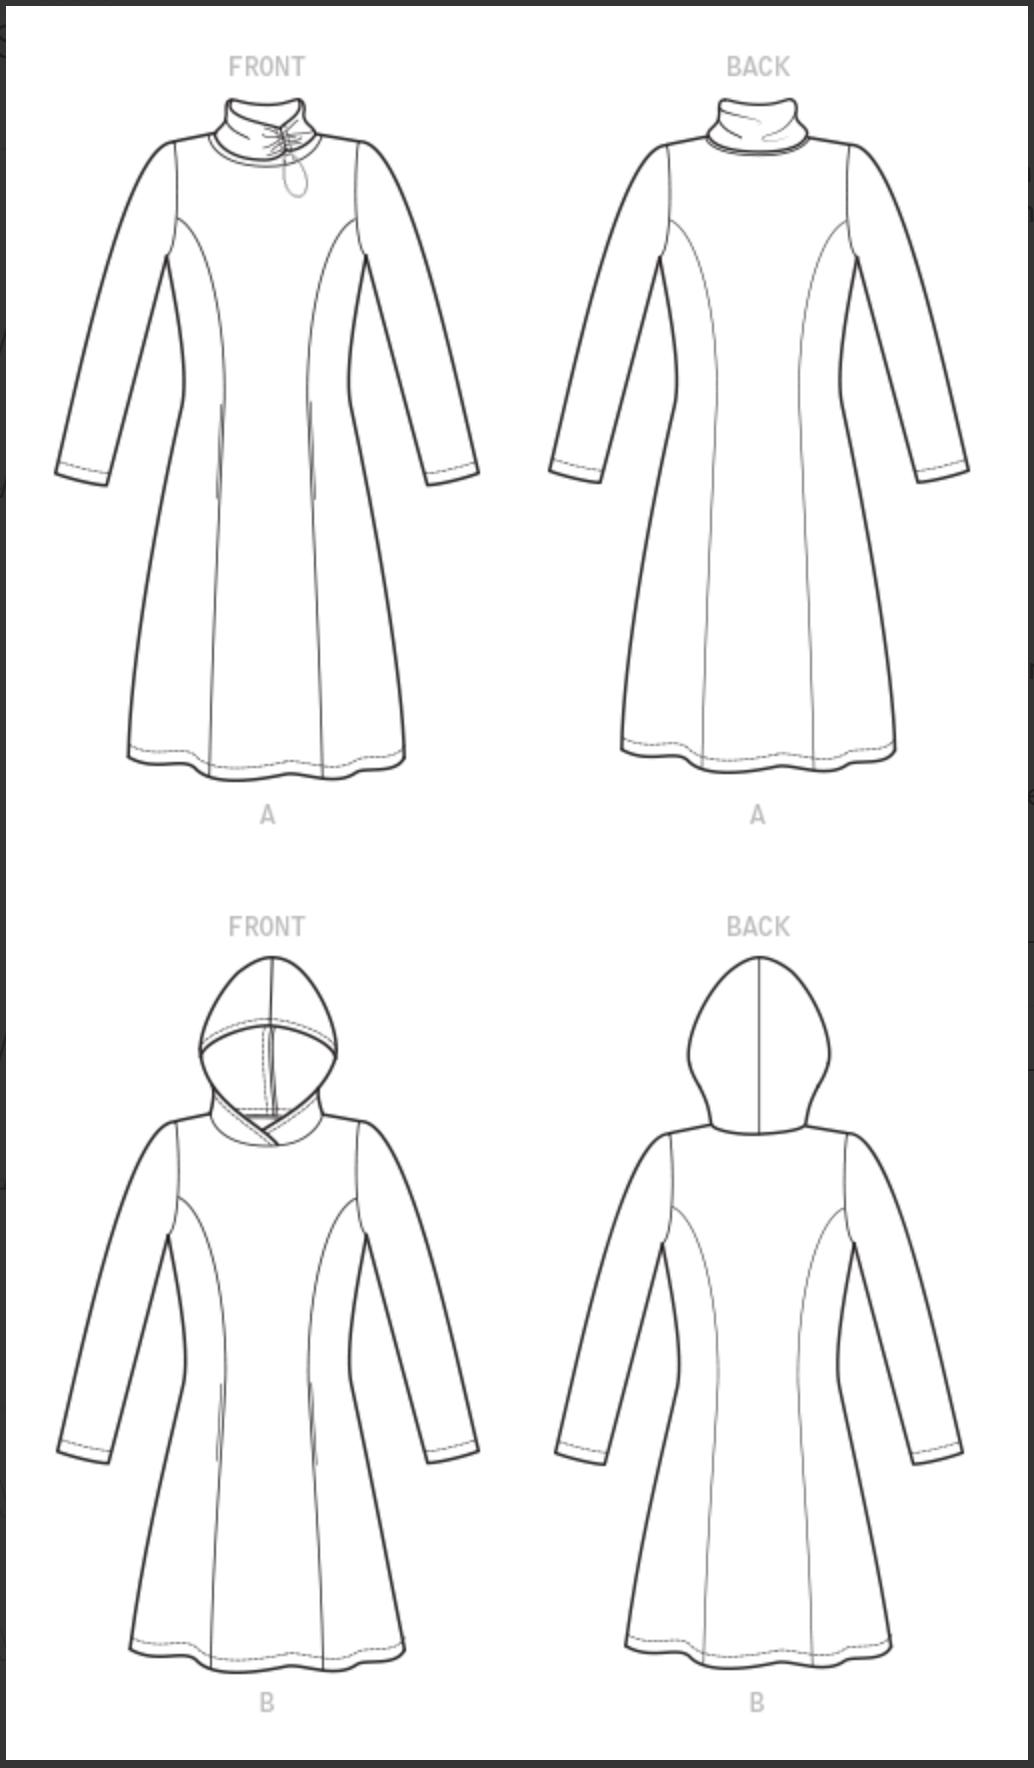 New! McCall's M8022 Dress Pattern and Tunic Pattern by